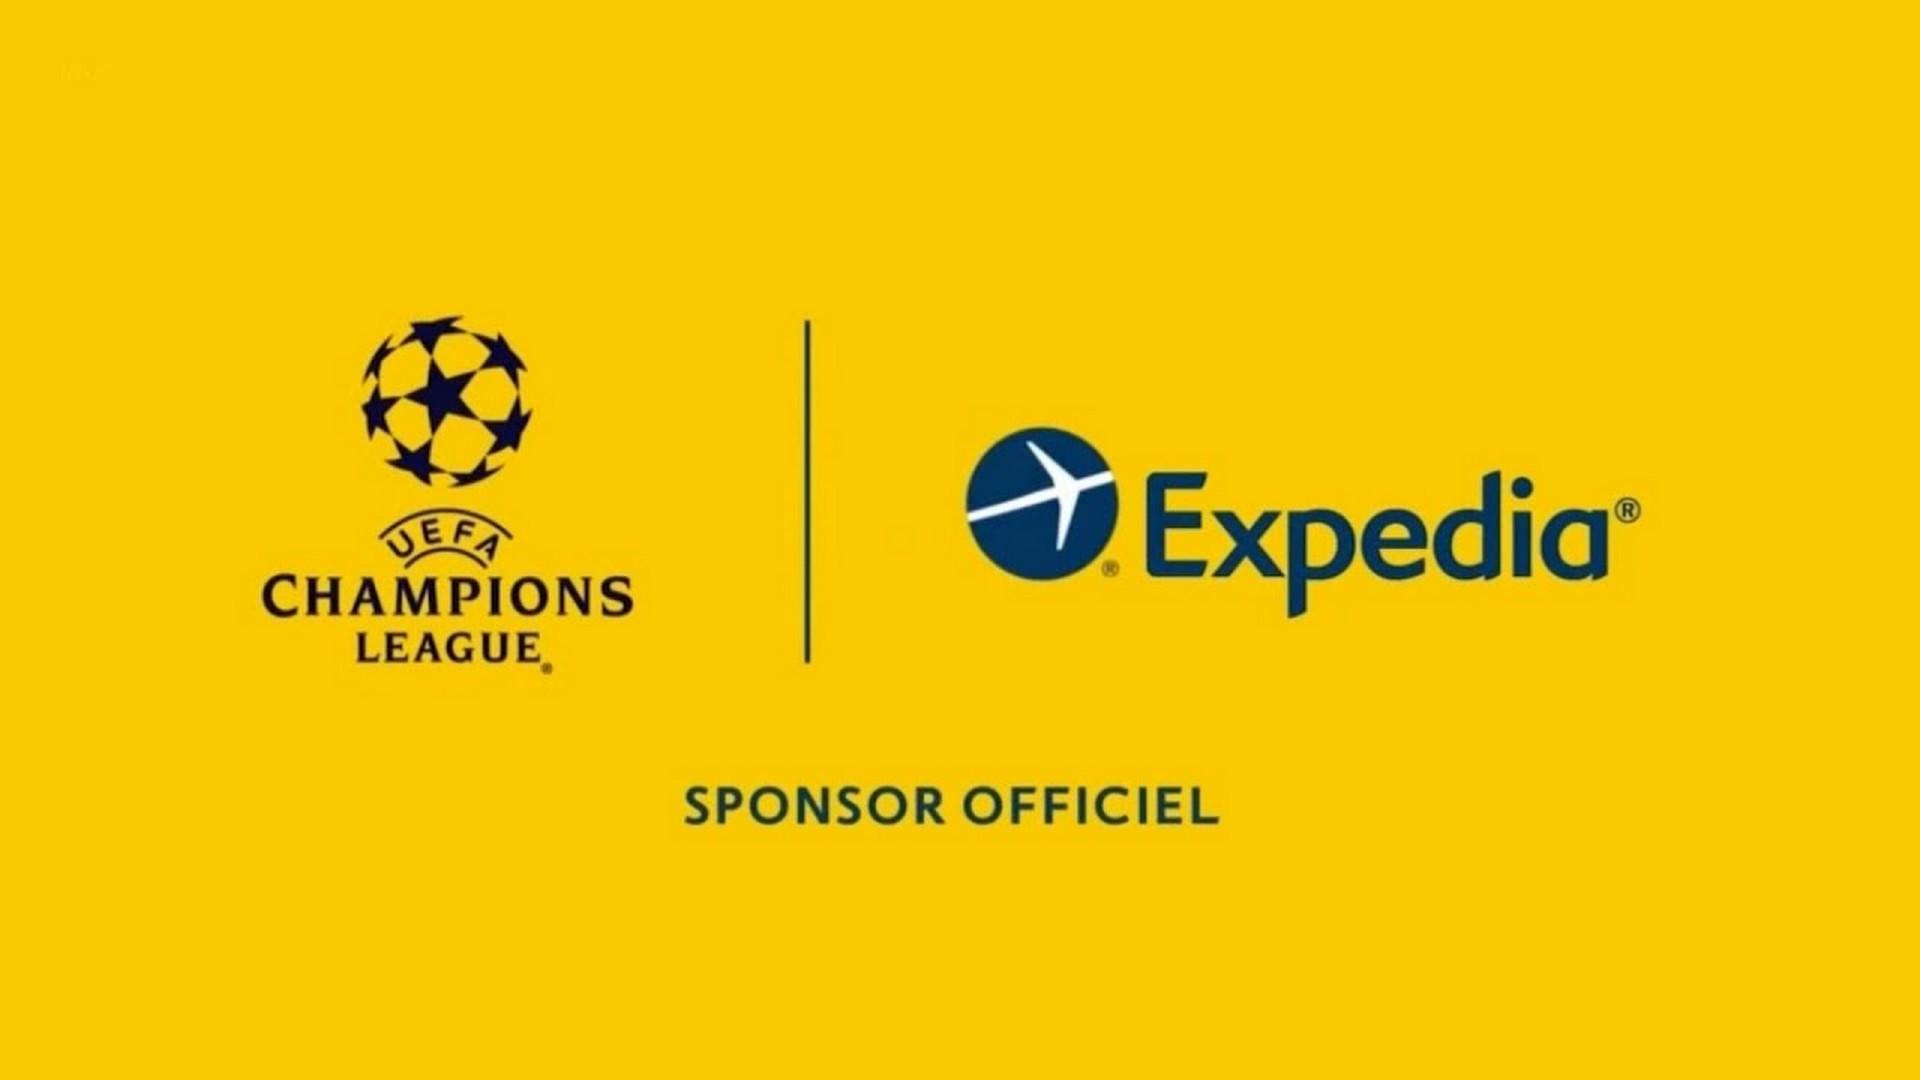 Expedia x Ligue des champions (football) 2021